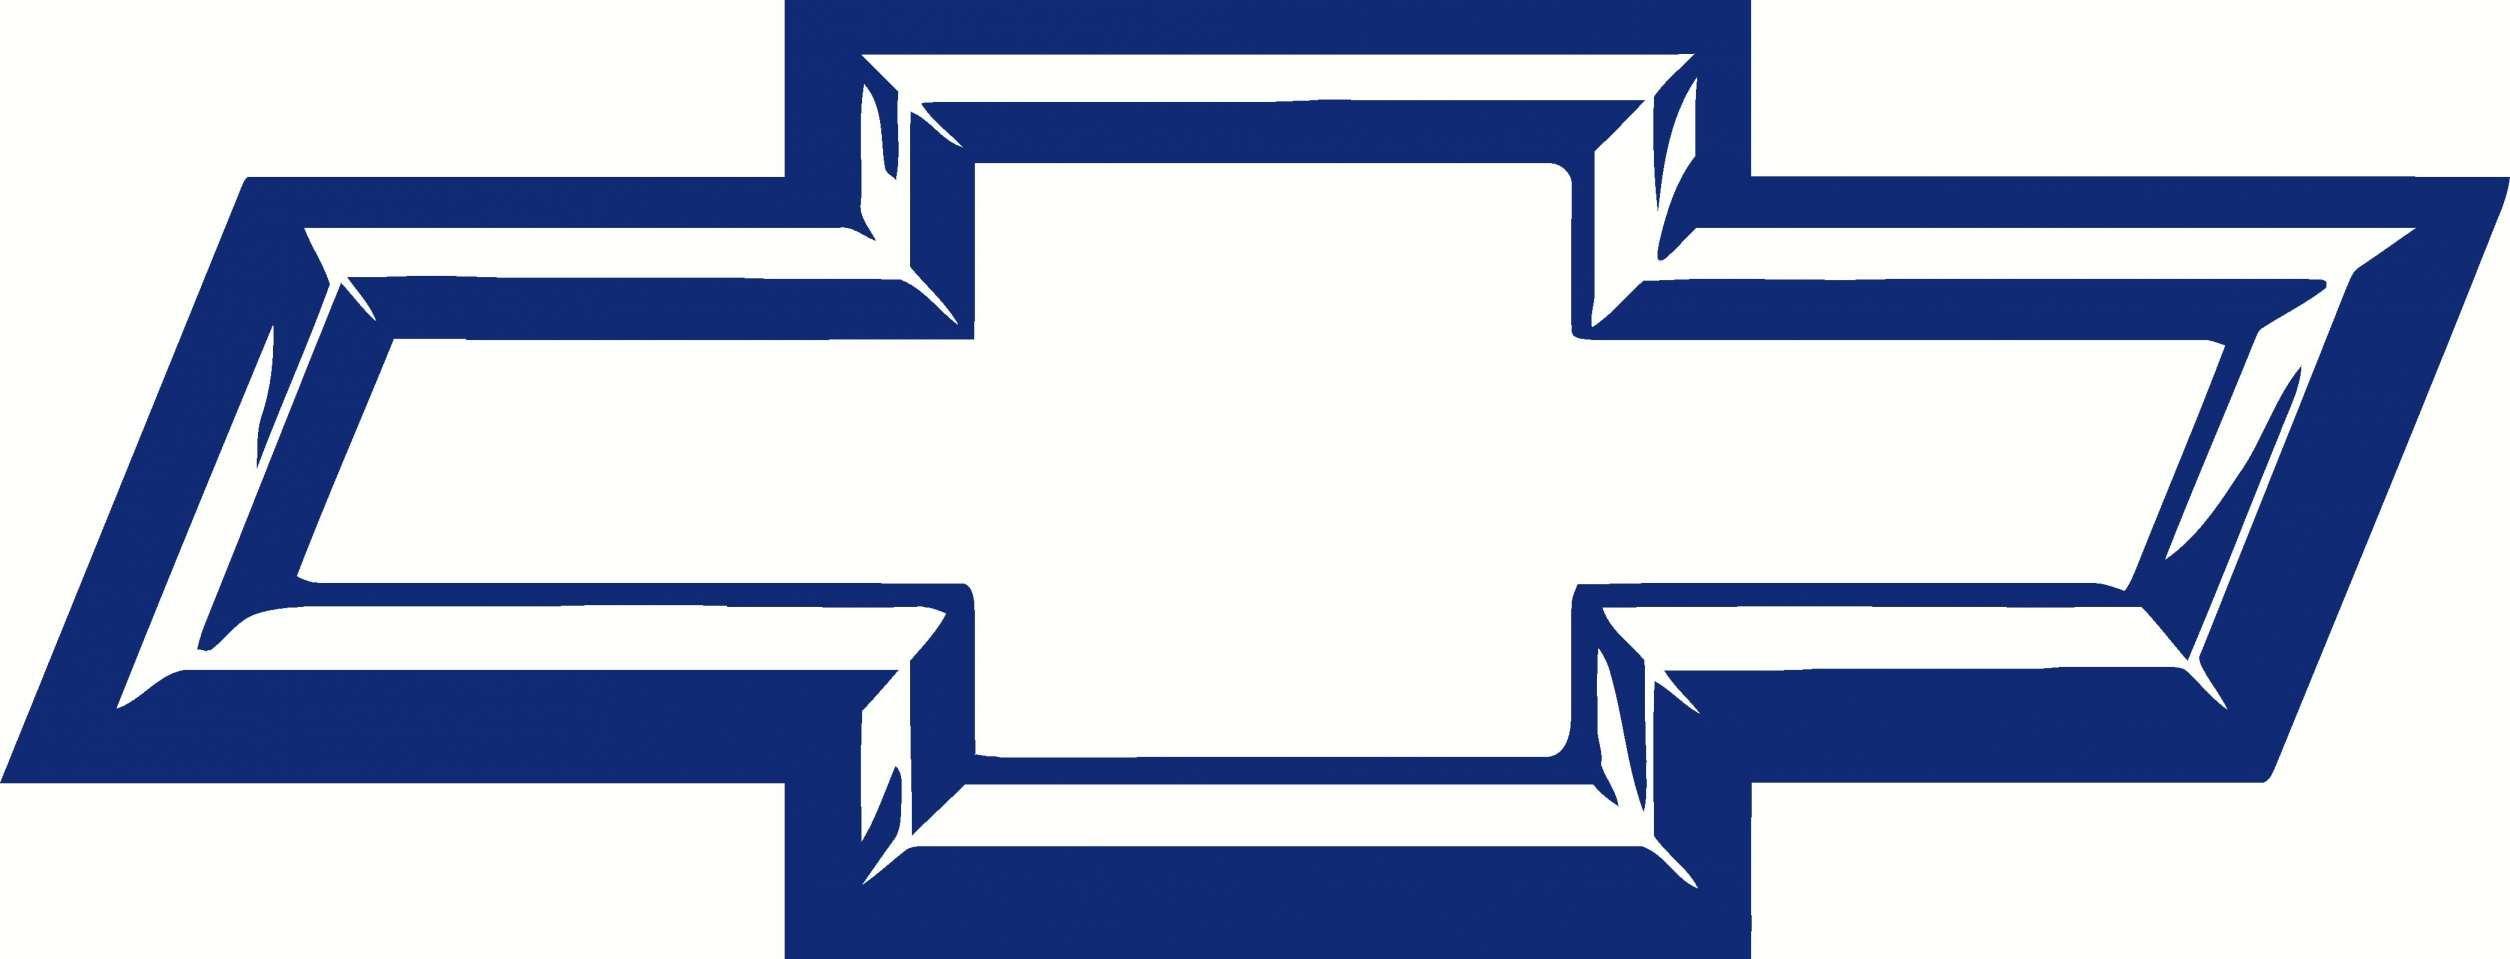 Chevrolet Logos Download Chevrolet Emblem Chevrolet Logo Logos